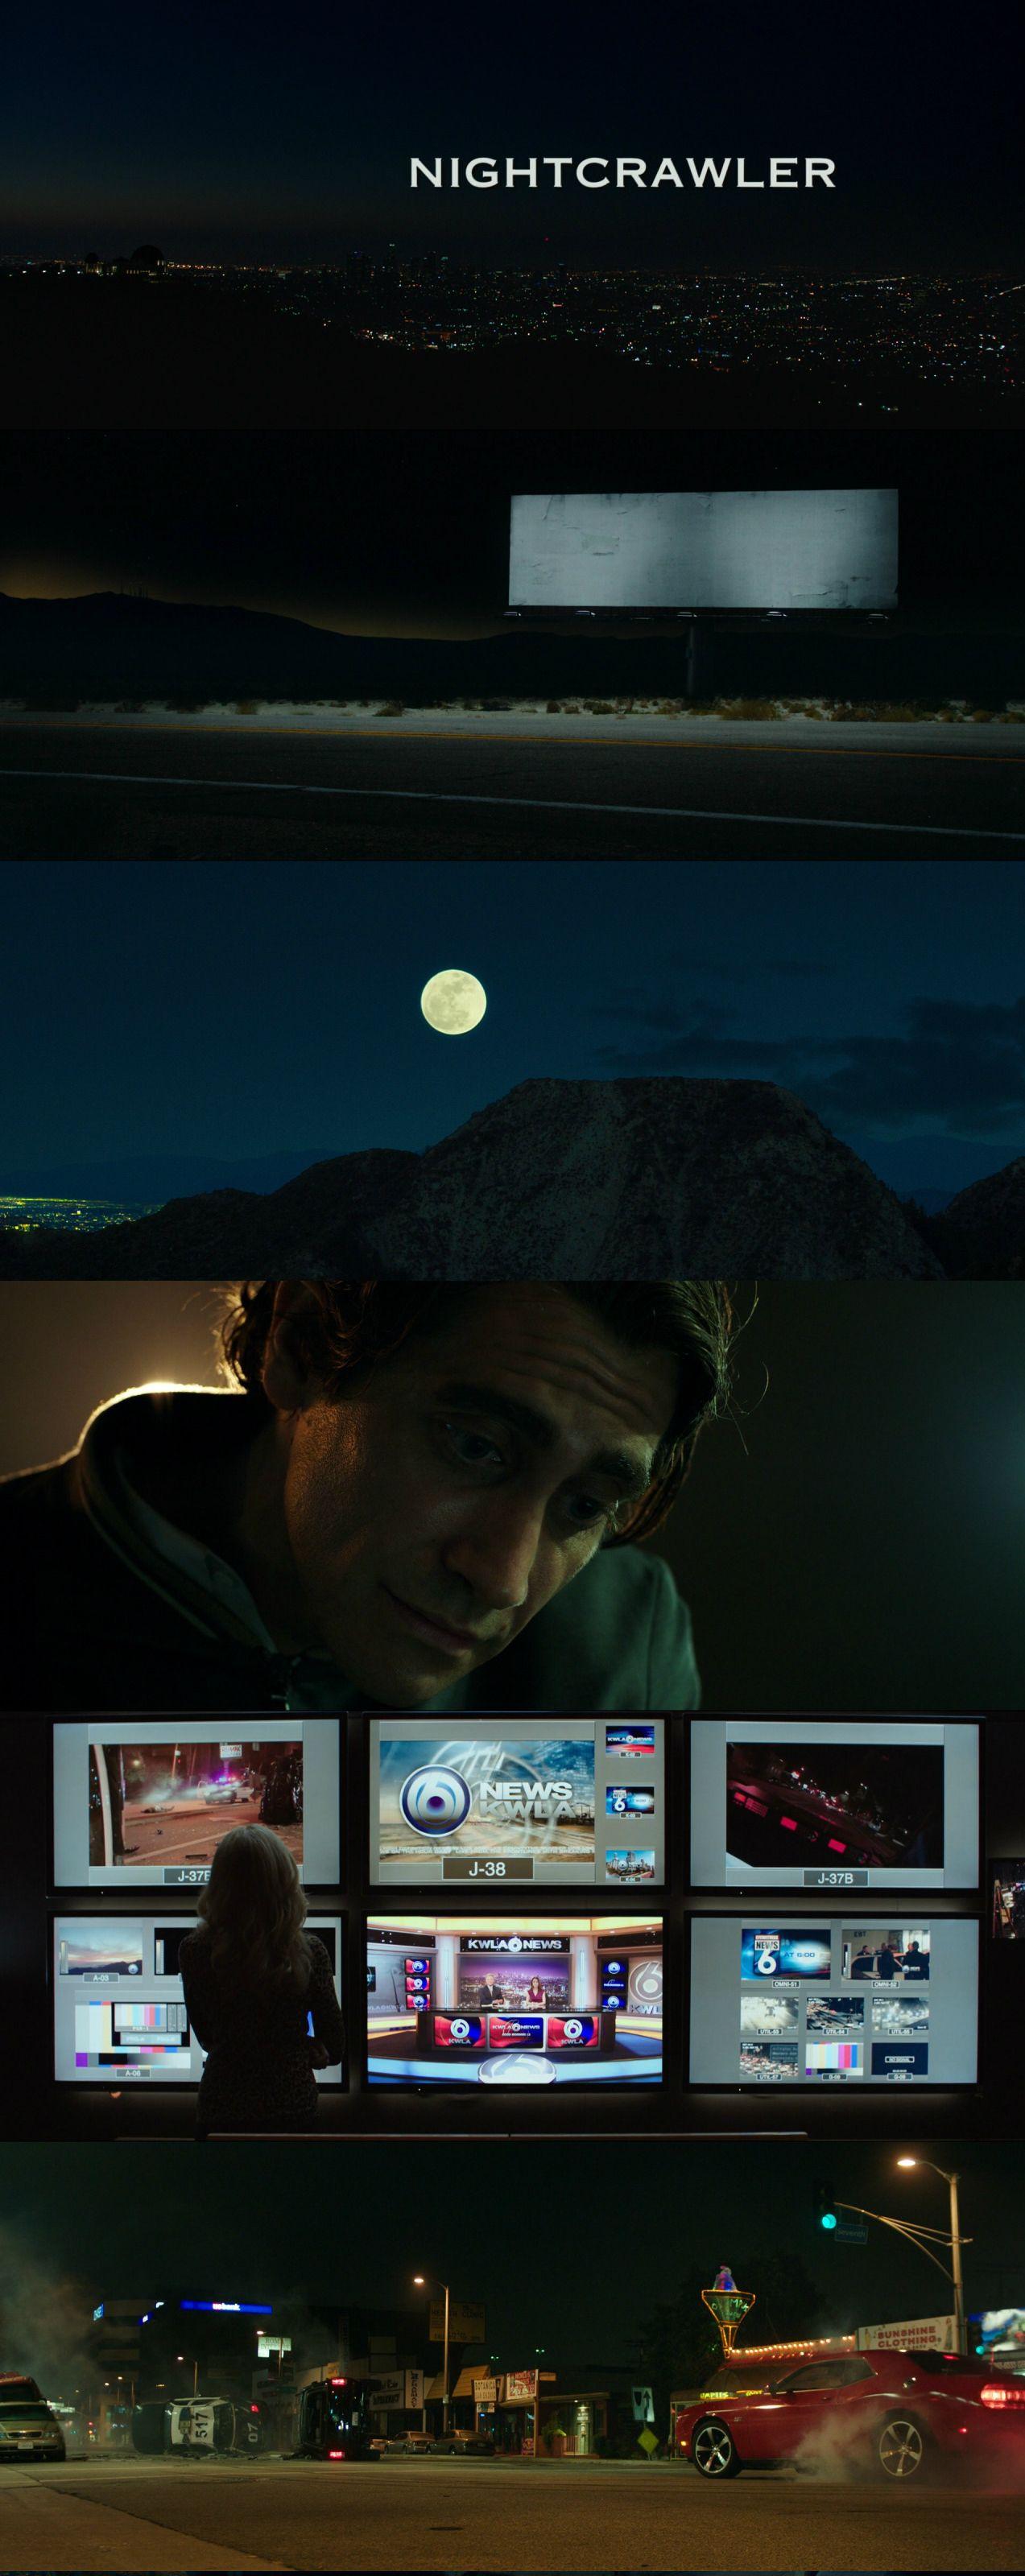 Nightcrawler (2014) Directed by: Dan Gilroy Cinematography: Robert Elswit, ASC